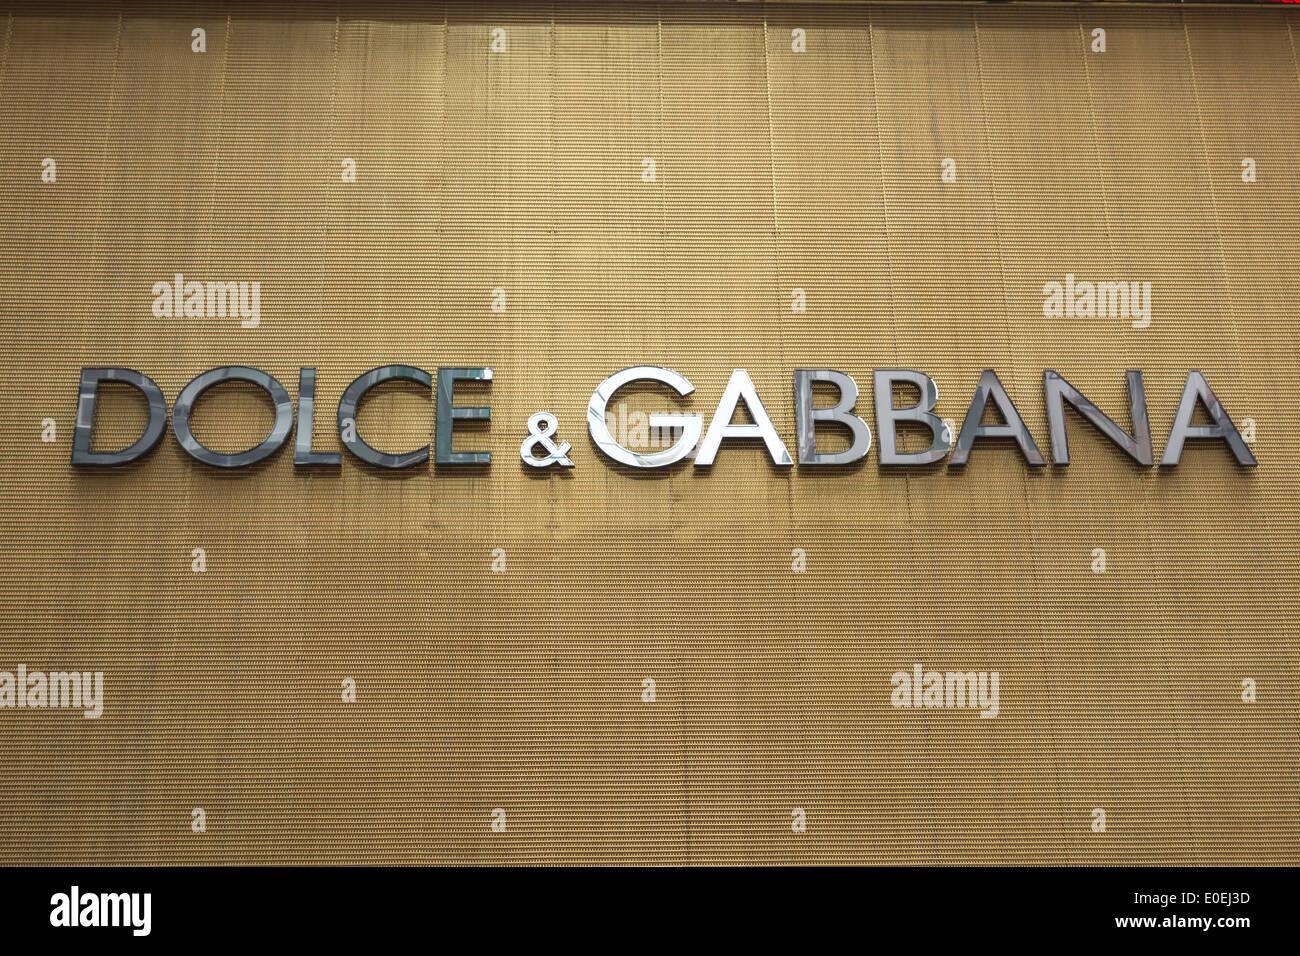 Dolce & Gabbana Shop in Hong Kong - Stock Image